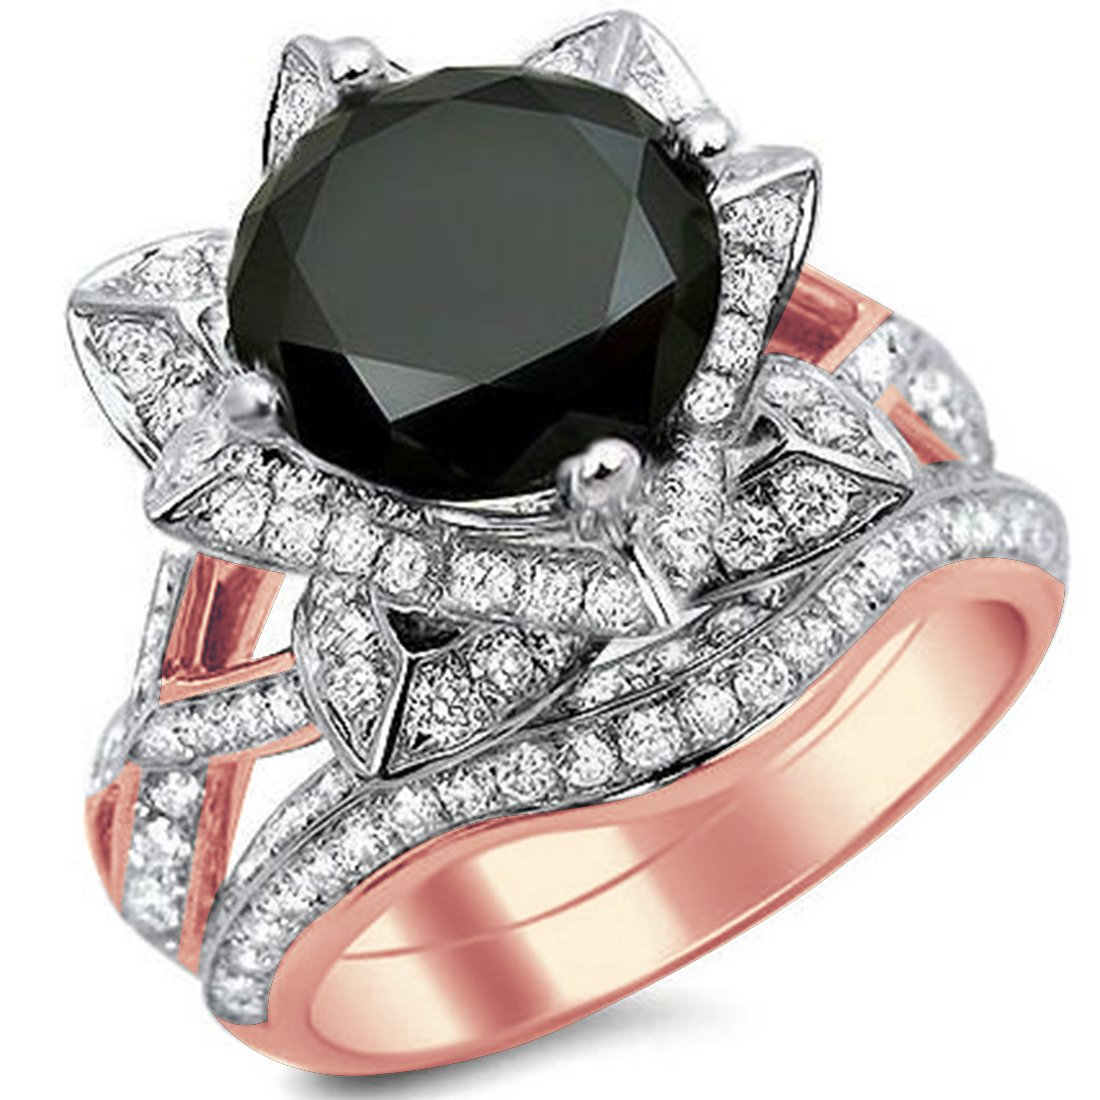 Smjewels 3.60 Ct Black Round Sim.Diamond Lotus Flower Engagement Ring Set In 14K Rose Gold Fn